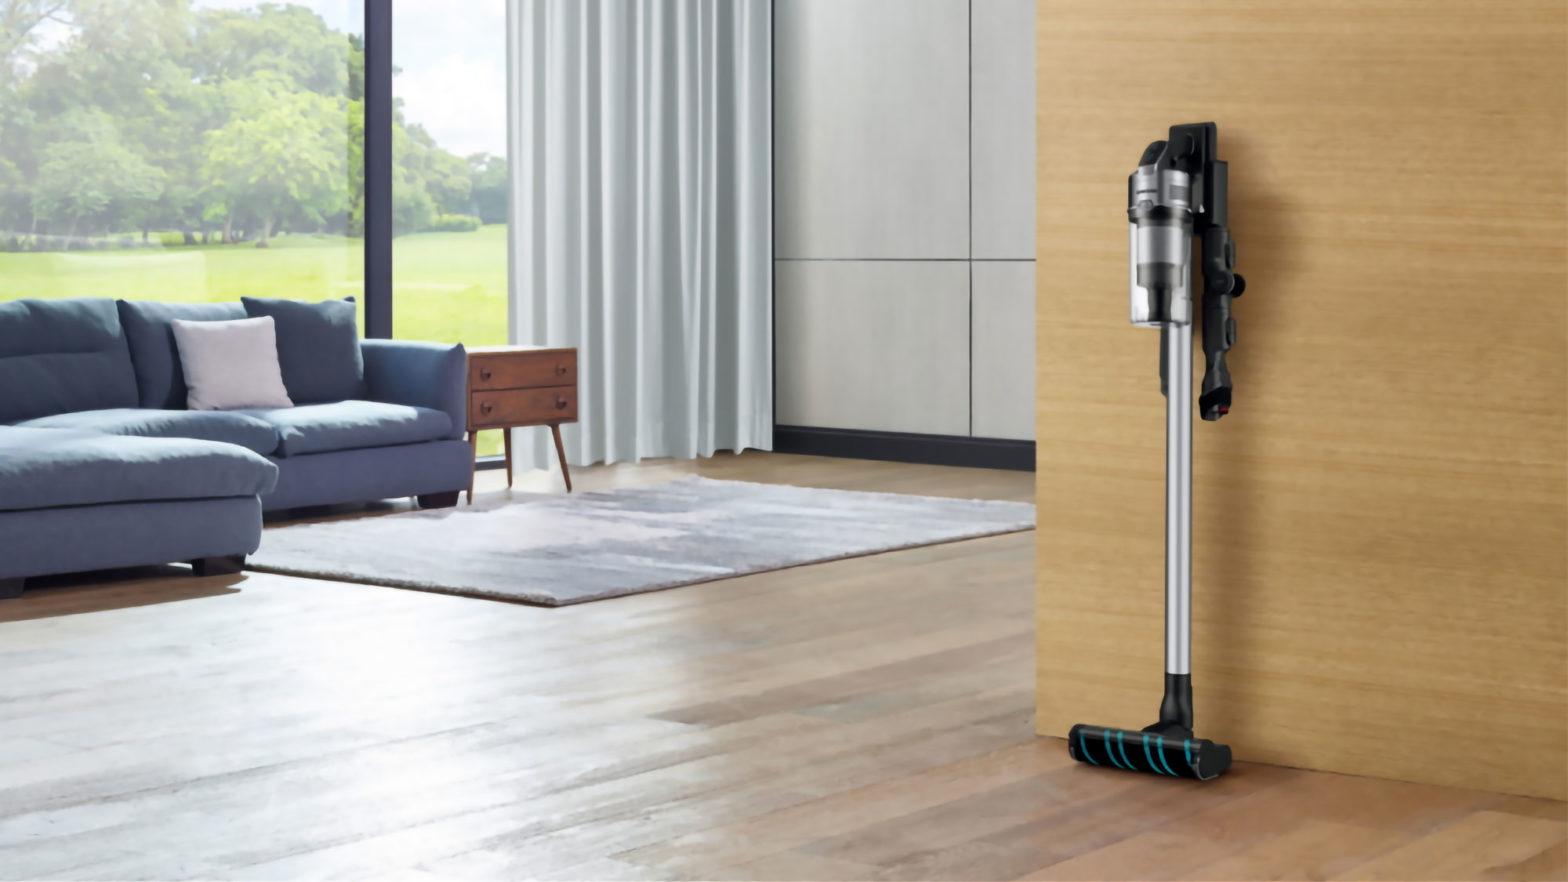 Samsung Jet Cordless Stick Vacuum Cleaner